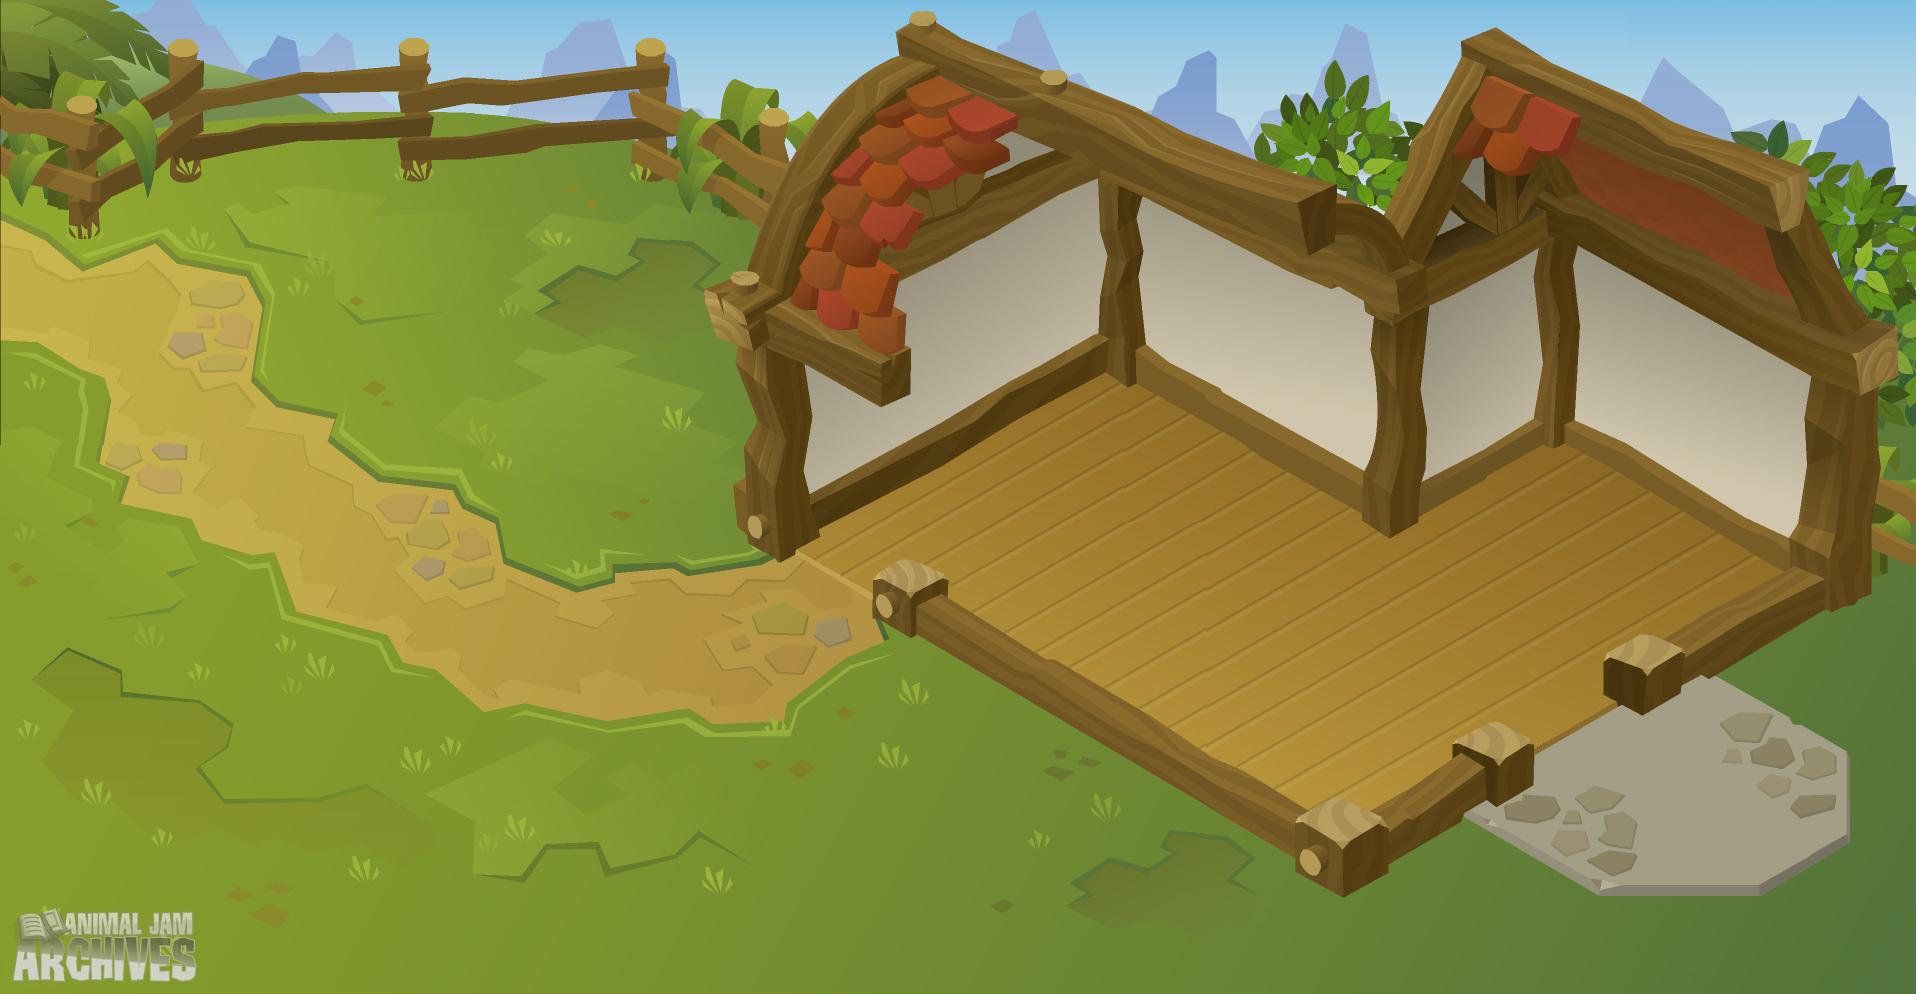 Small Den Map